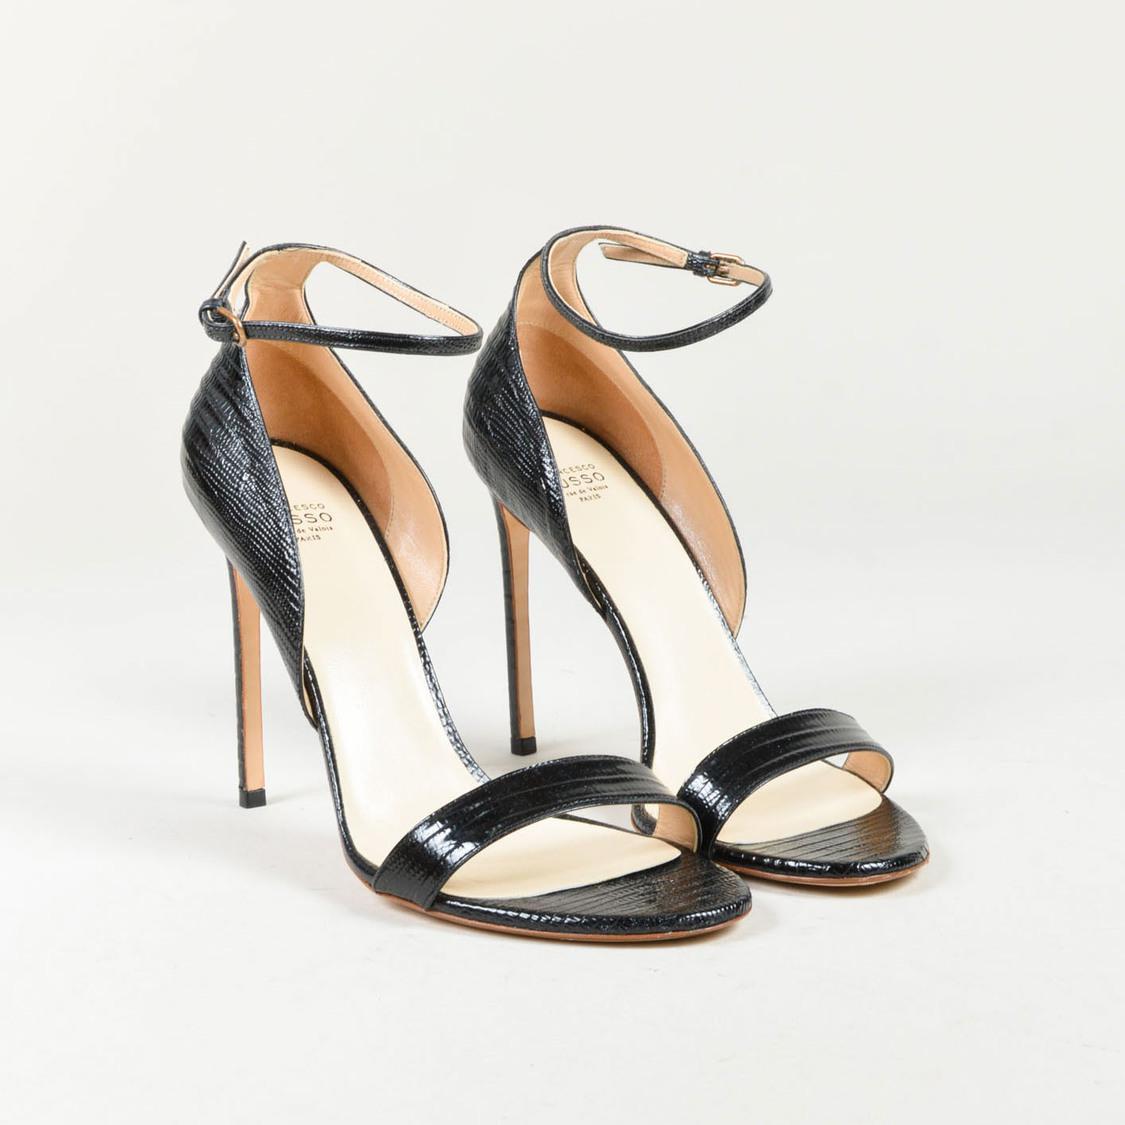 12d31e928835 Francesco Russo. Women s Nero Black Lizard Skin   Leather Ankle Strap  Sandals